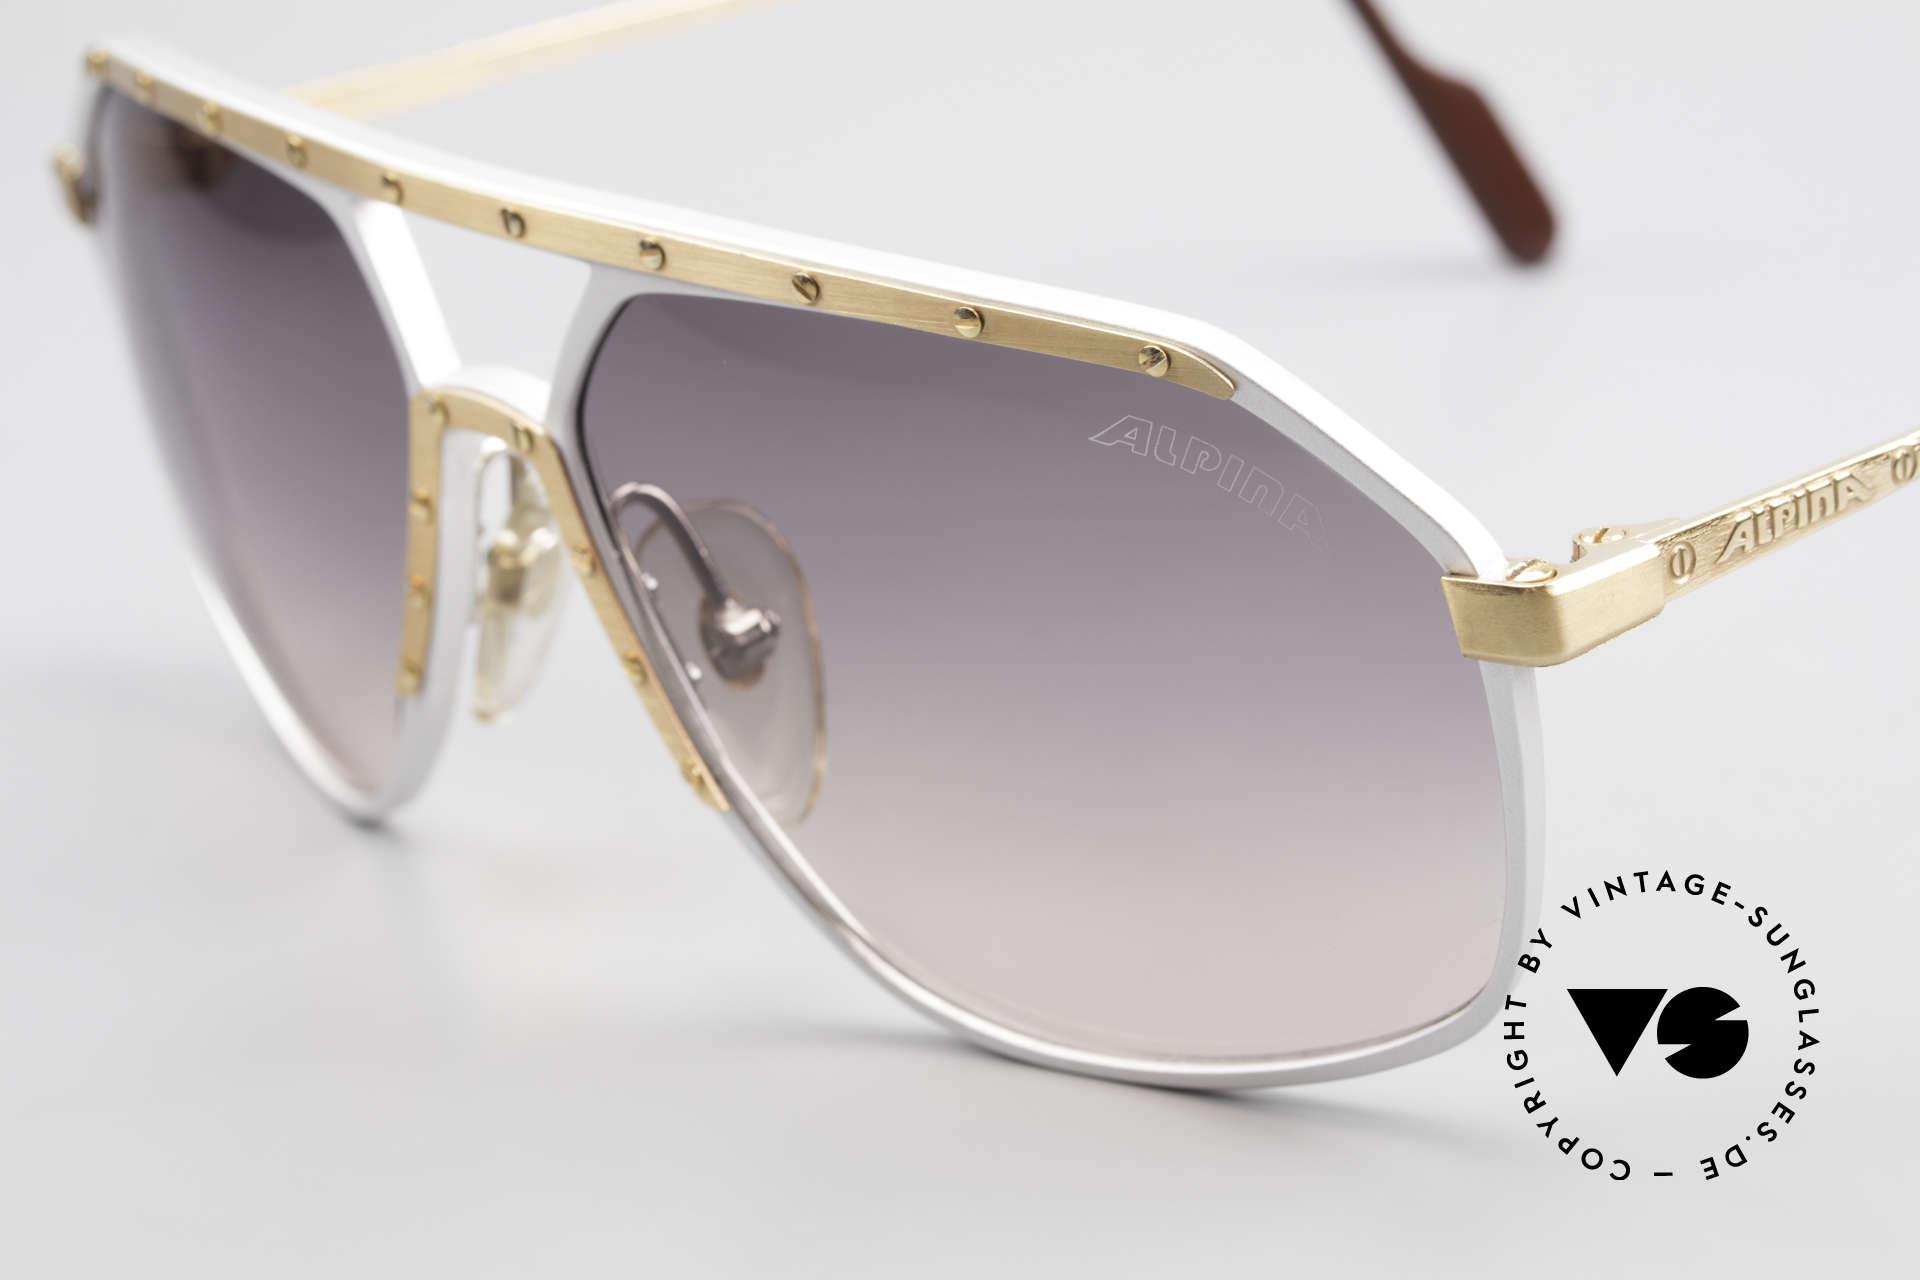 Alpina M6 Vintage Glasses Par Excellence, silver frame, golden screws and ornamental cover, Made for Men and Women